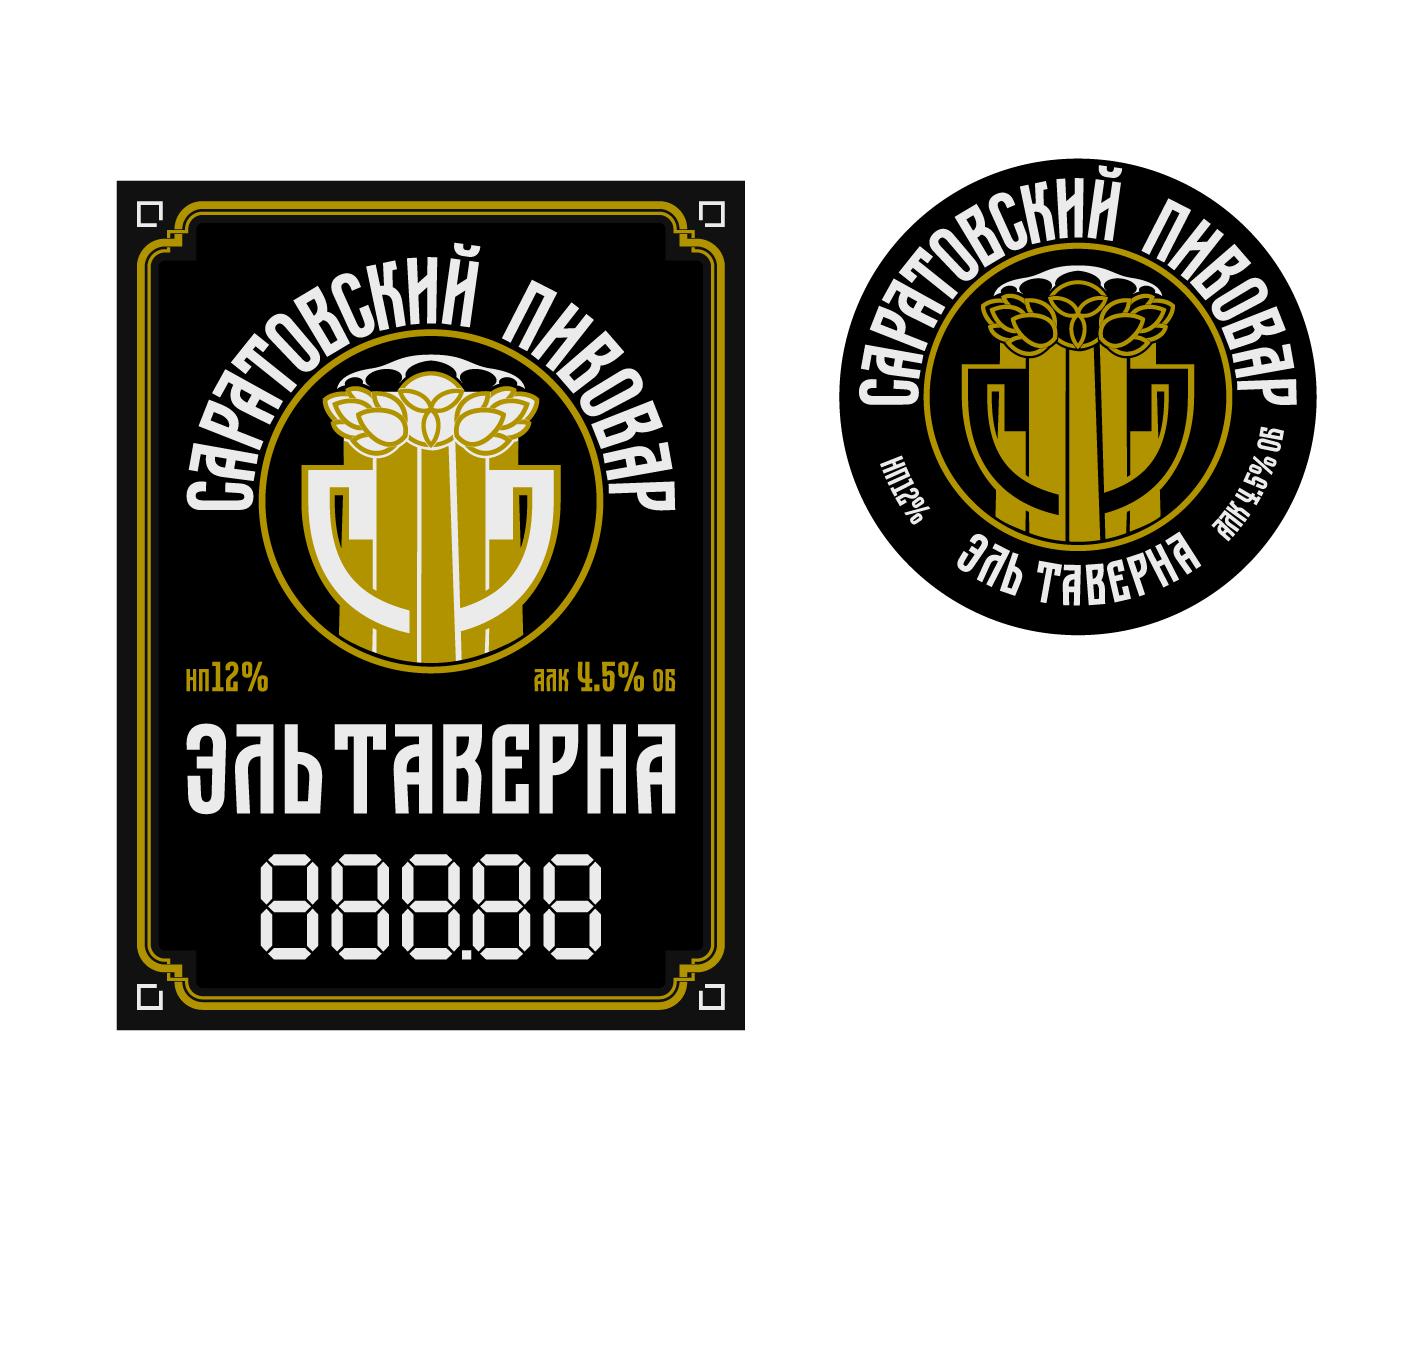 Разработка логотипа для частной пивоварни фото f_6985d7fba76beefb.png